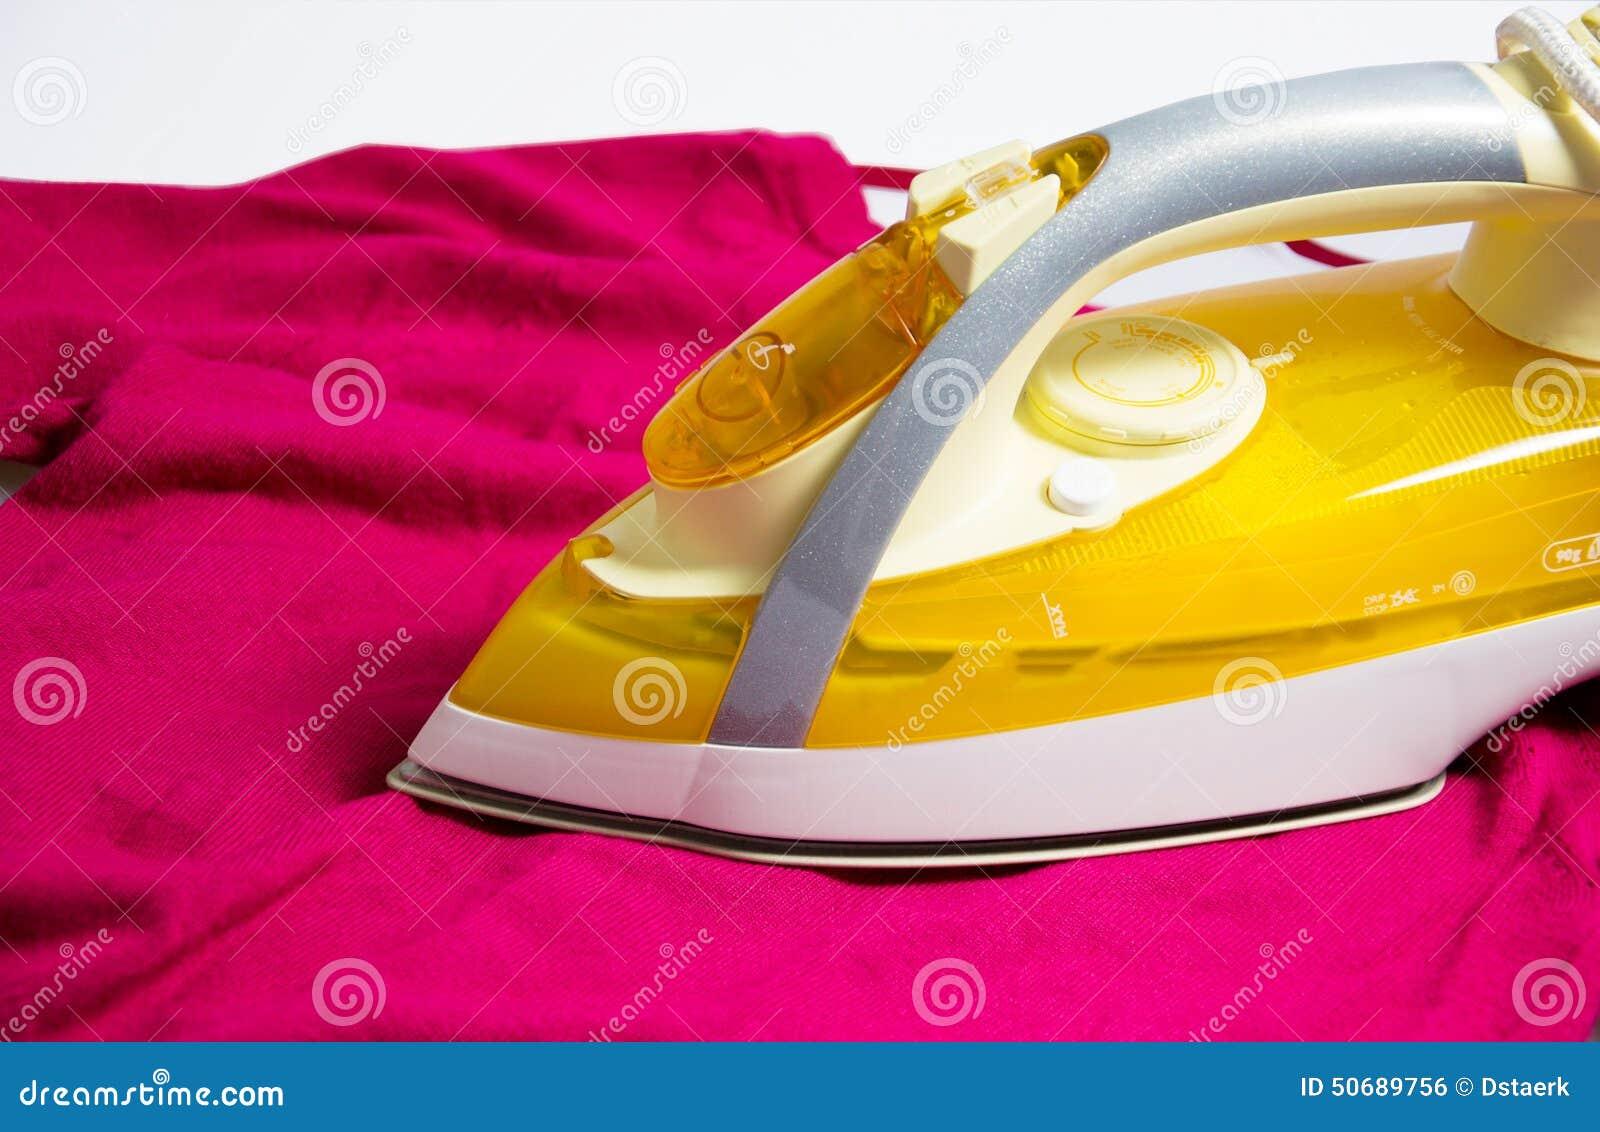 Download 电烙 库存照片. 图片 包括有 衣裳, 现代, 工作, 空白, 会议室, 五颜六色, 照亮, 洗衣店, 国内 - 50689756